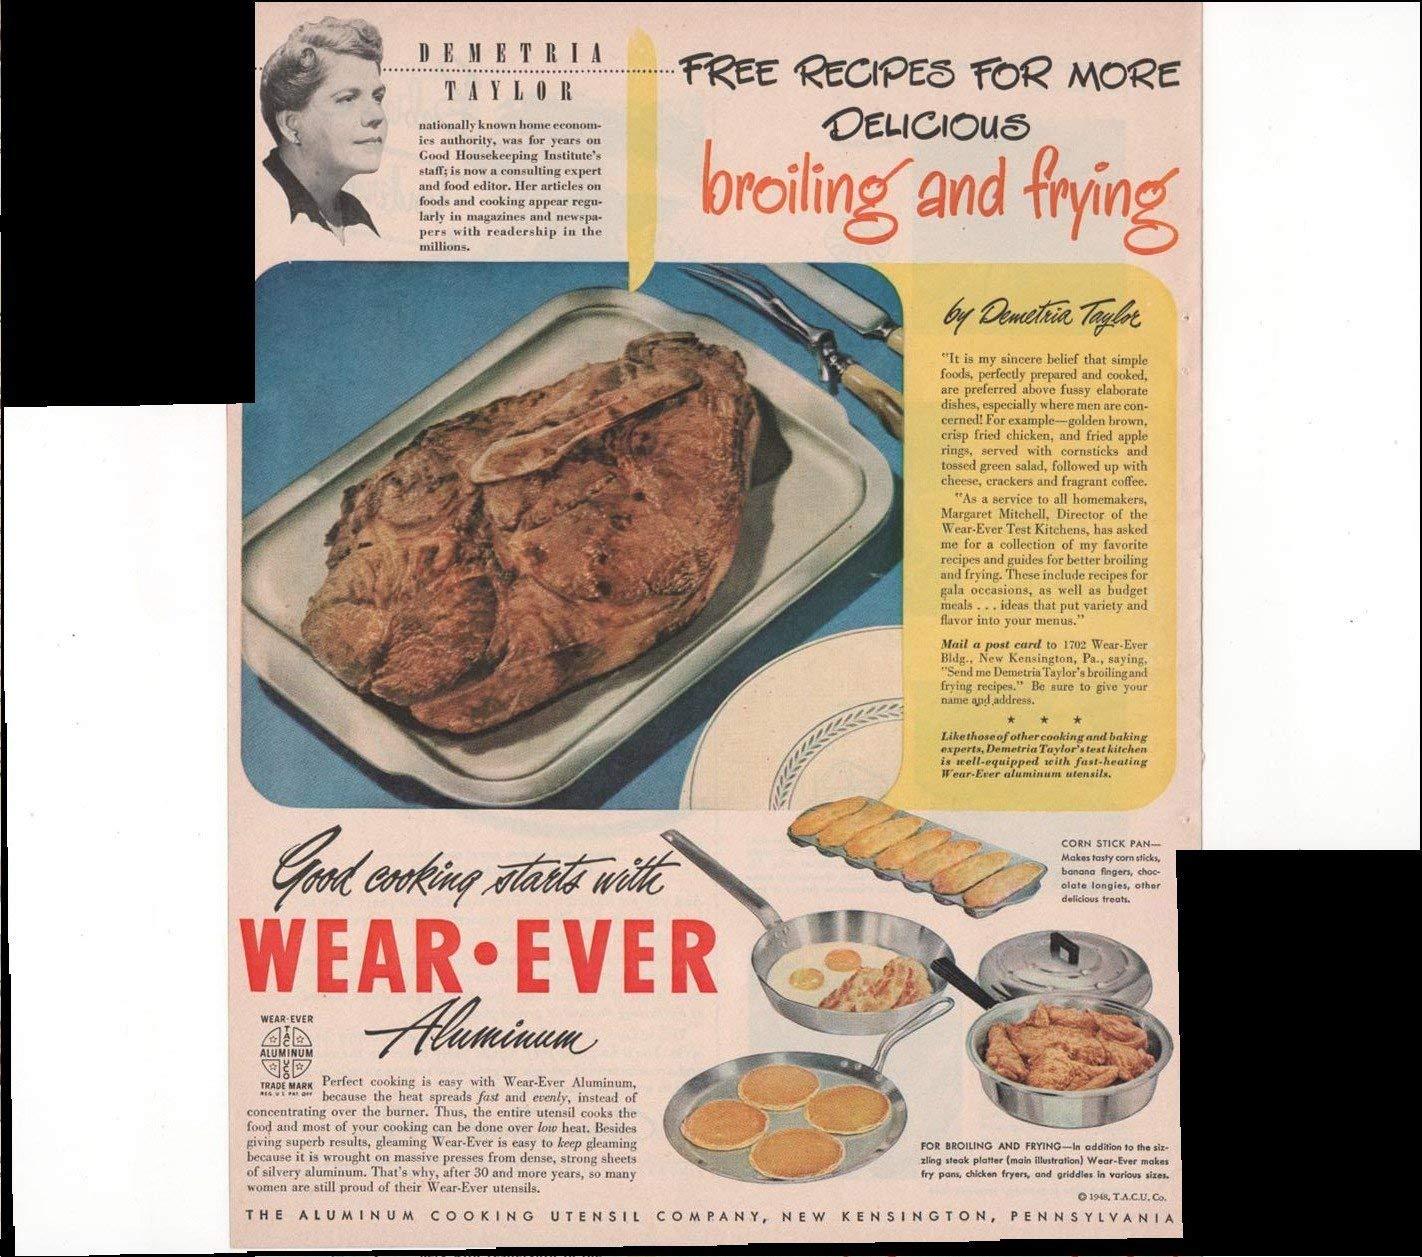 Vintage Recipes: 46 Delicious Potato Recipes - Potato Recipes from 1945